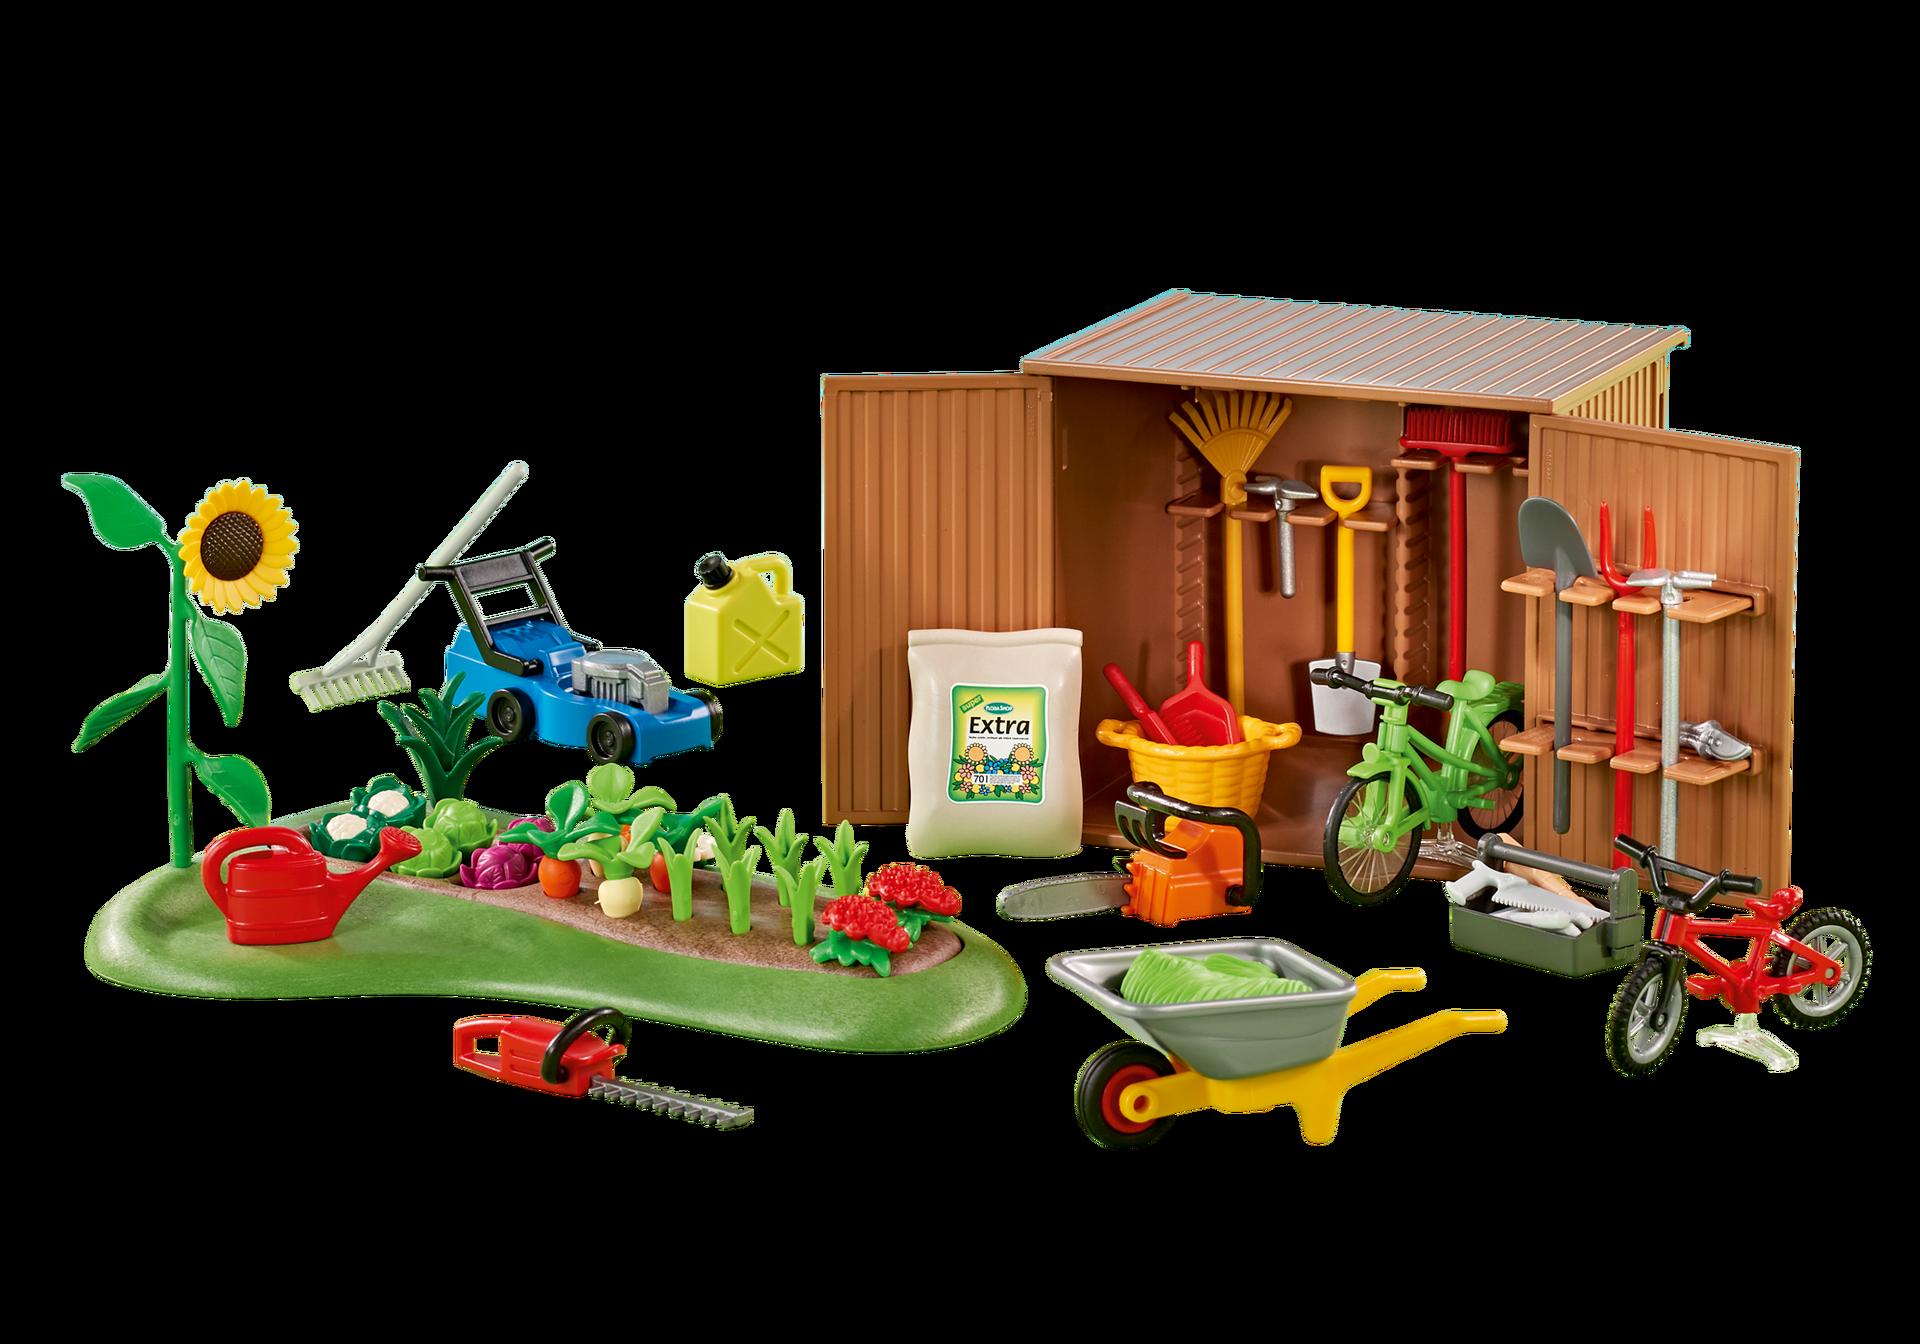 Http Media Playmobil Com I Playmobil 6558 Product Detail Playmobil Gartenschuppen Playmobil Deutschland